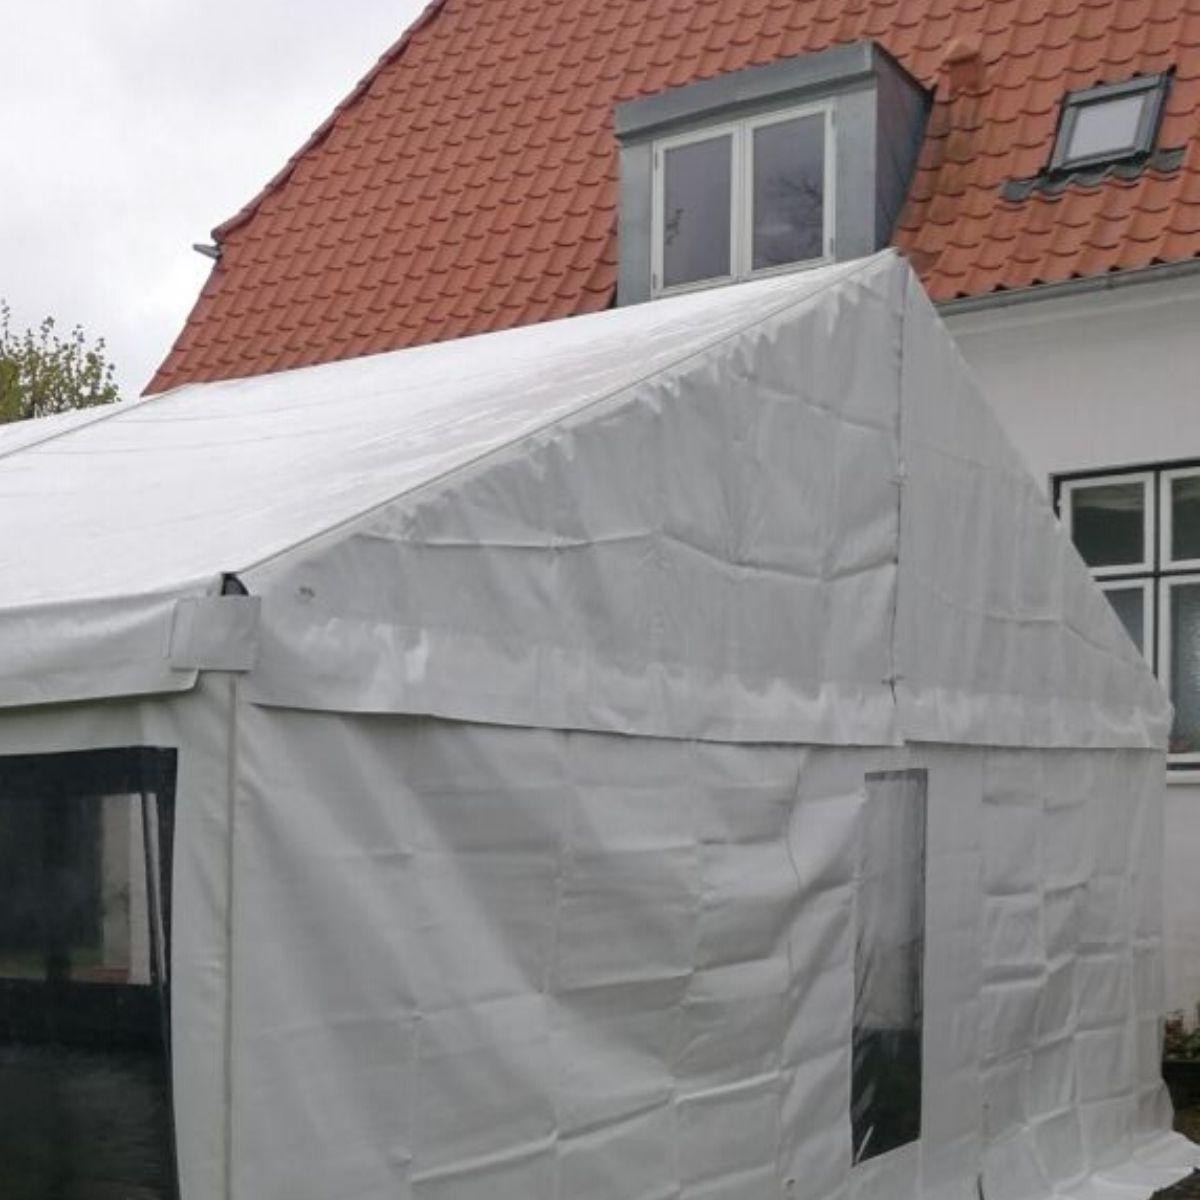 Telte 8 meter brede